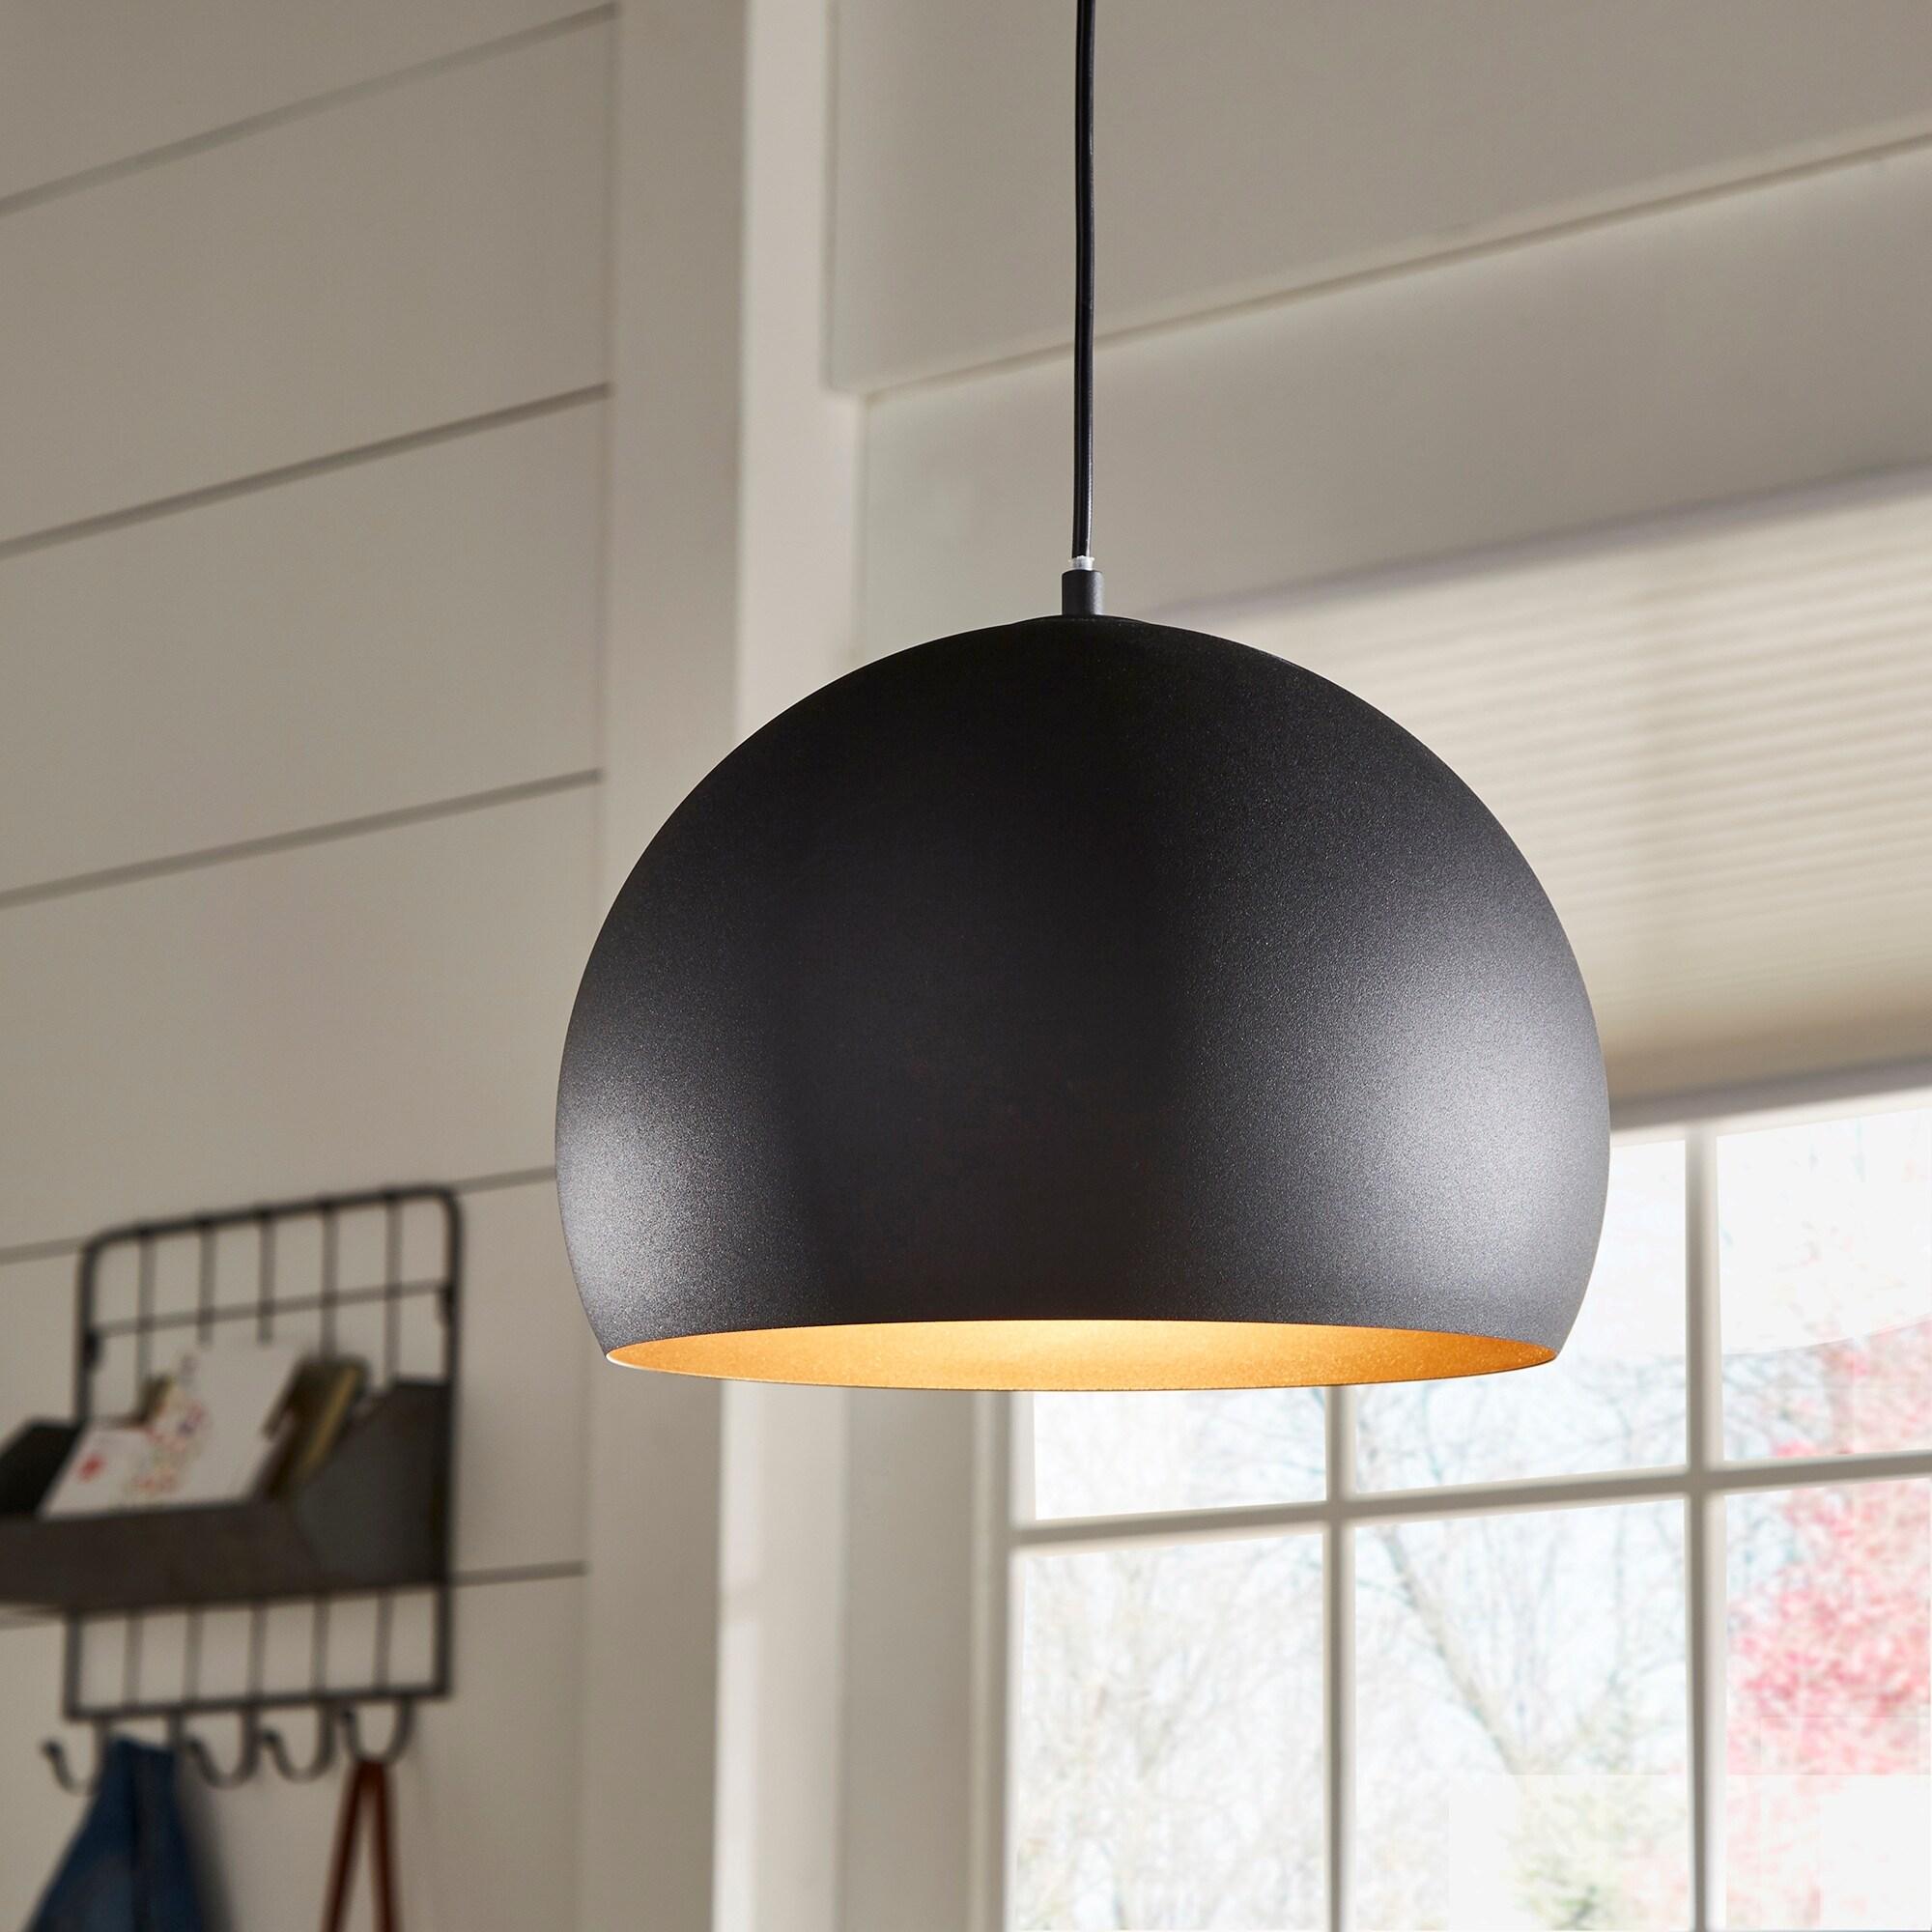 Shop Black Friday Deals On Jilian Black Dome Pendant Light By Inspire Q Modern Pendant Light Overstock 31053282